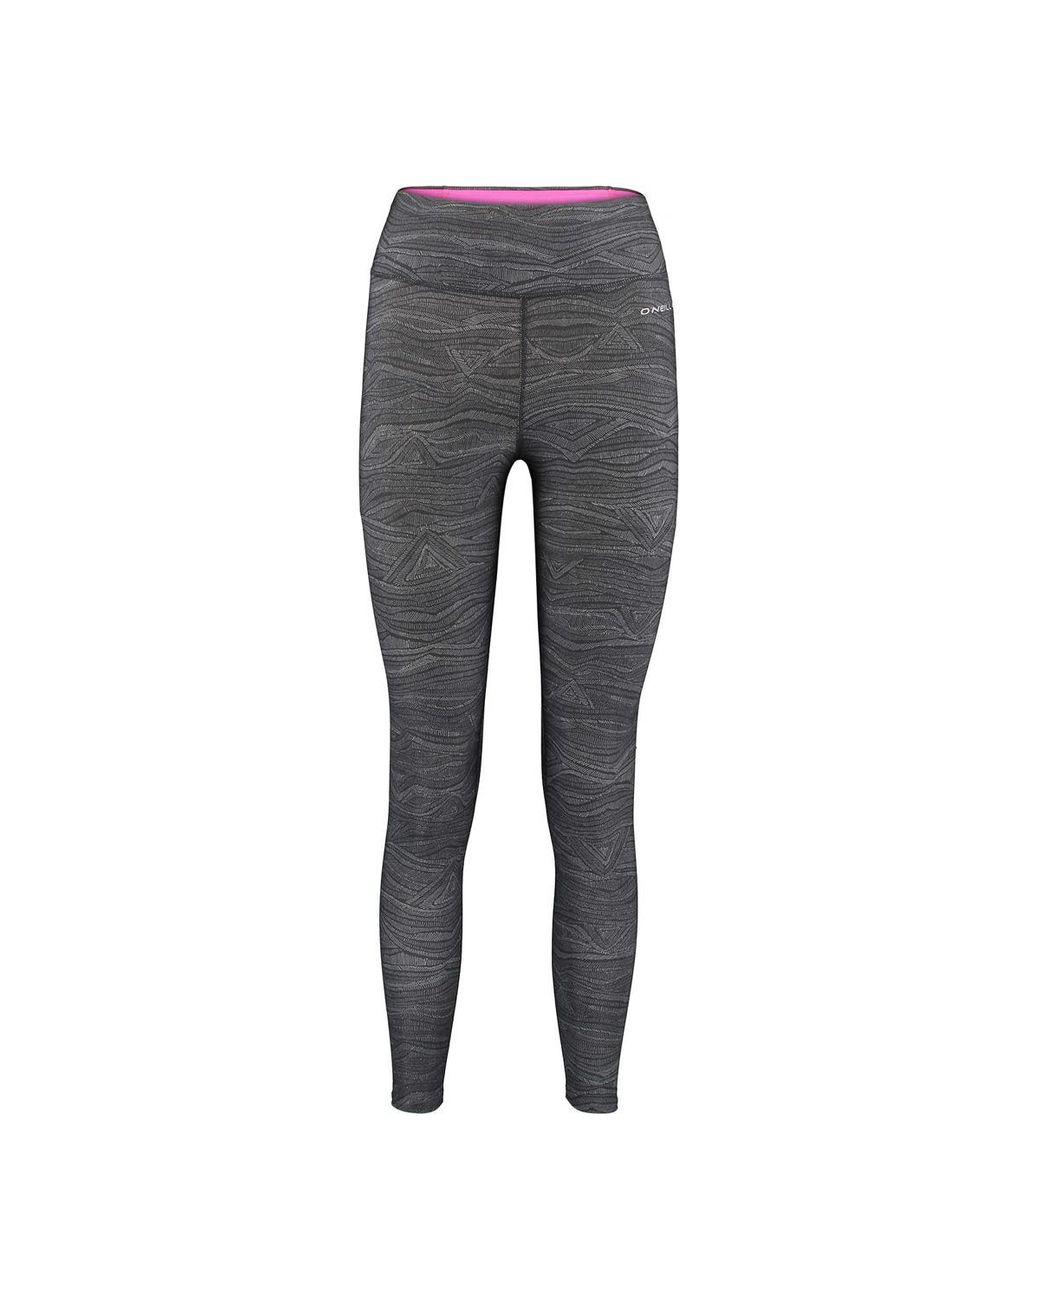 O Neill Printed Leggings 7//8/Length Pants